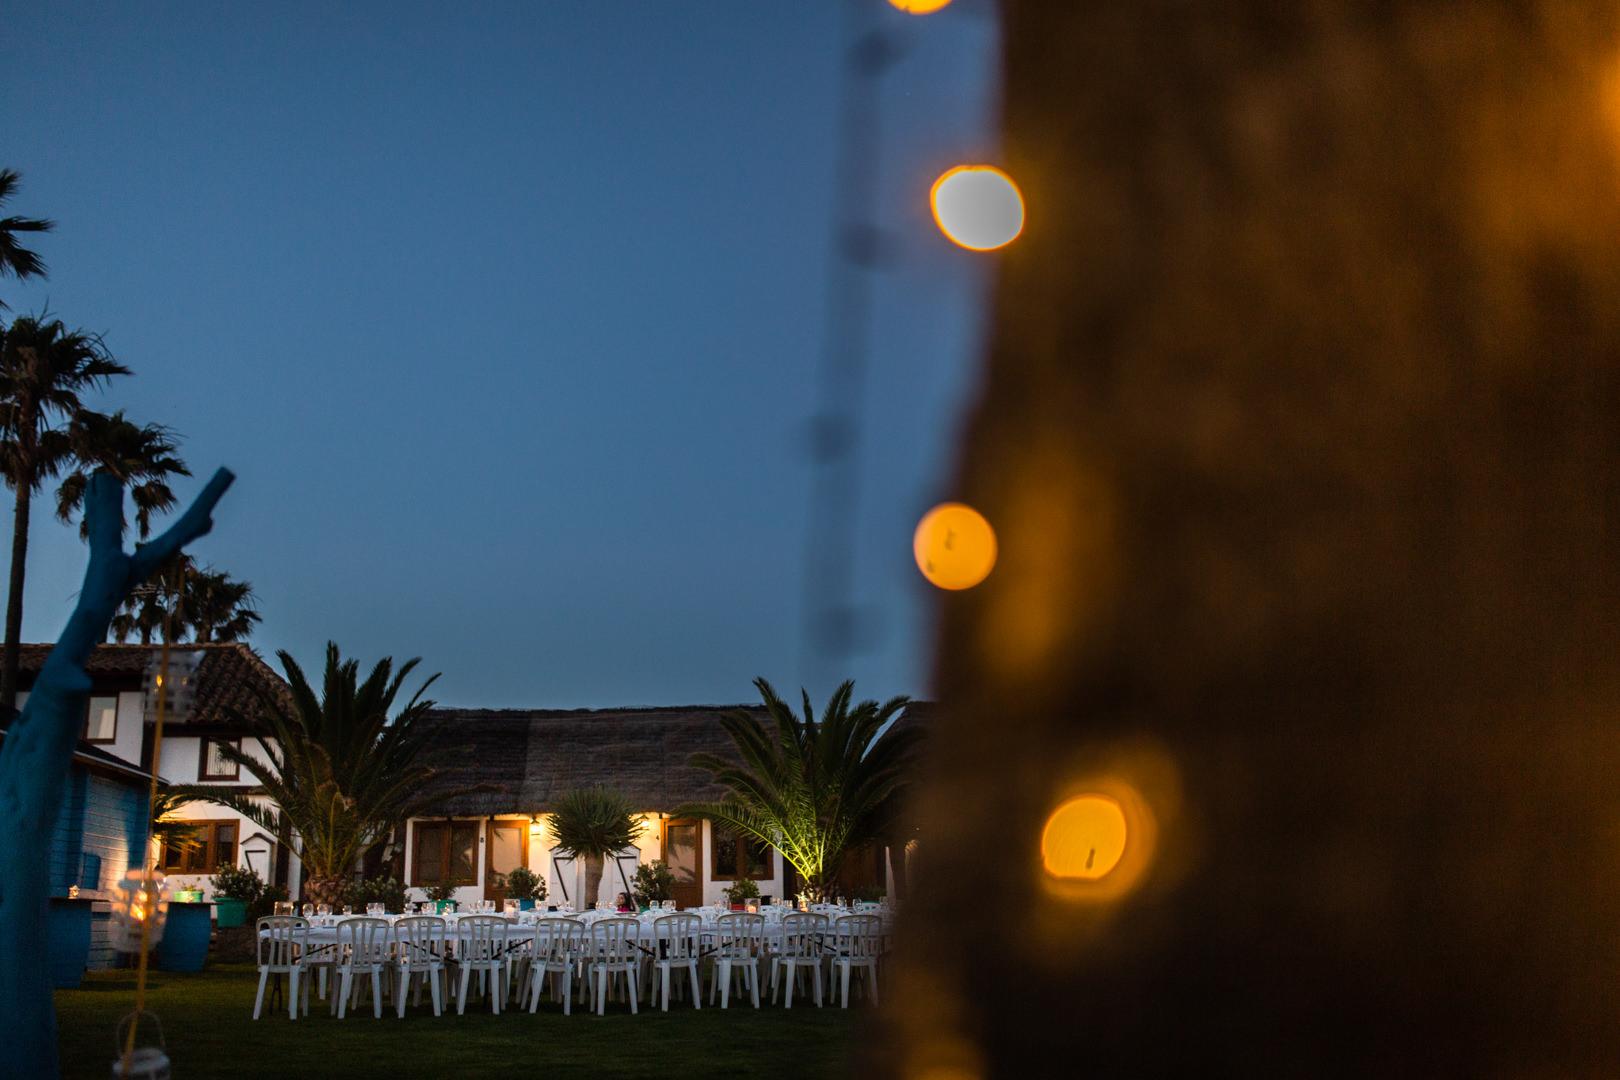 Boda-Sajorami-Beach-Cadiz-Zahora-Pedro-Gema-engagement-Rafael-Torres-fotografo-bodas-sevilla-madrid-barcelona-wedding-photographer--3.jpg